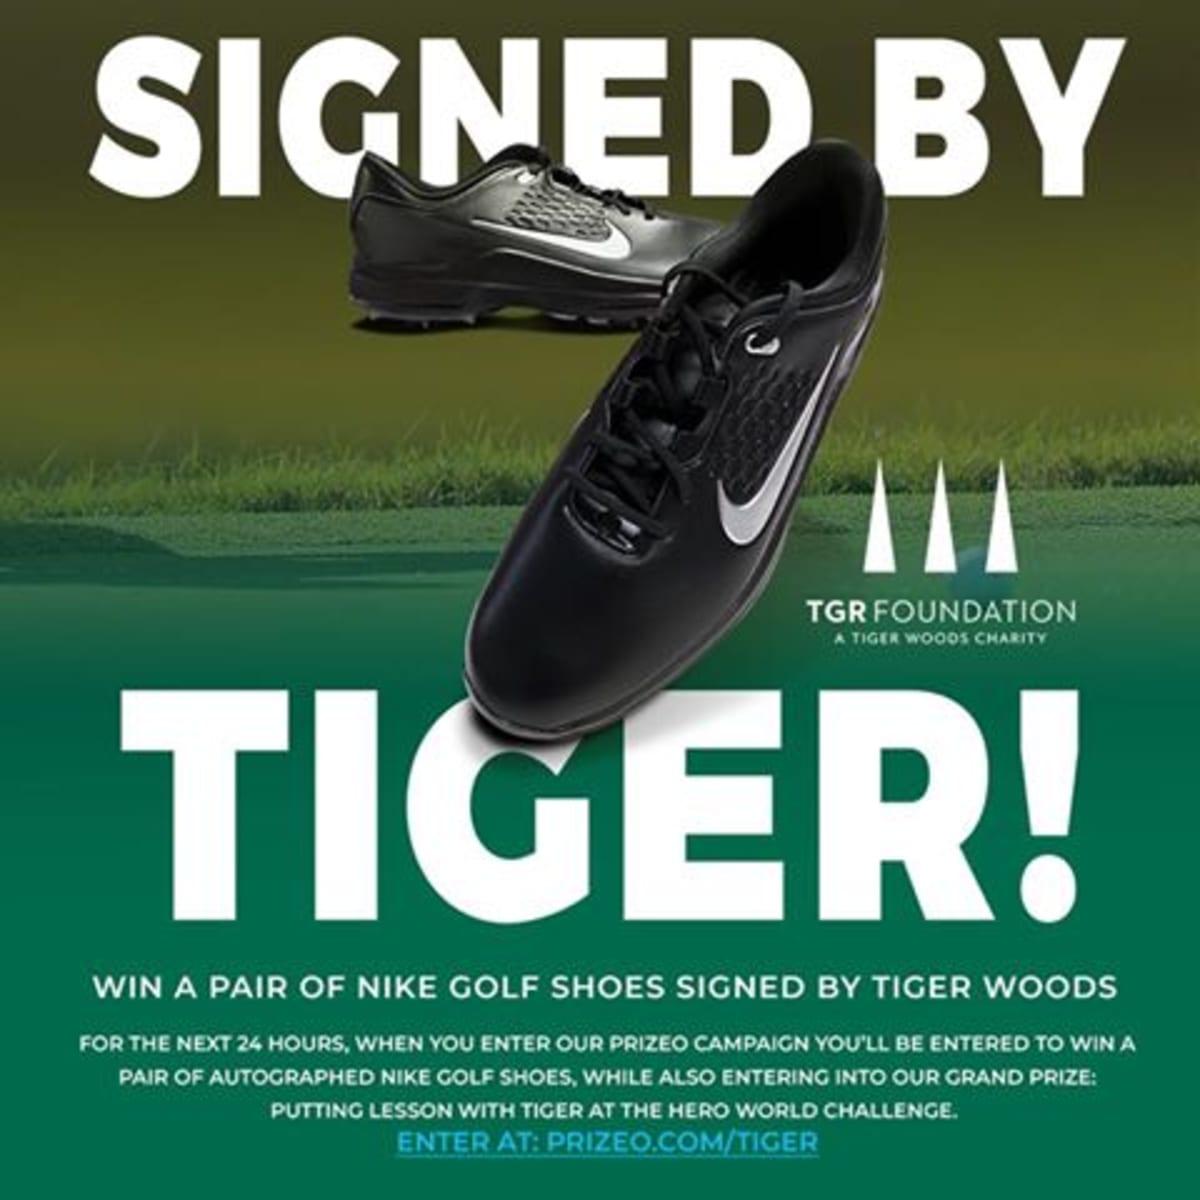 PGA TOUR Perfil de Tiger Woods - Noticias, Estadisticas, Videos